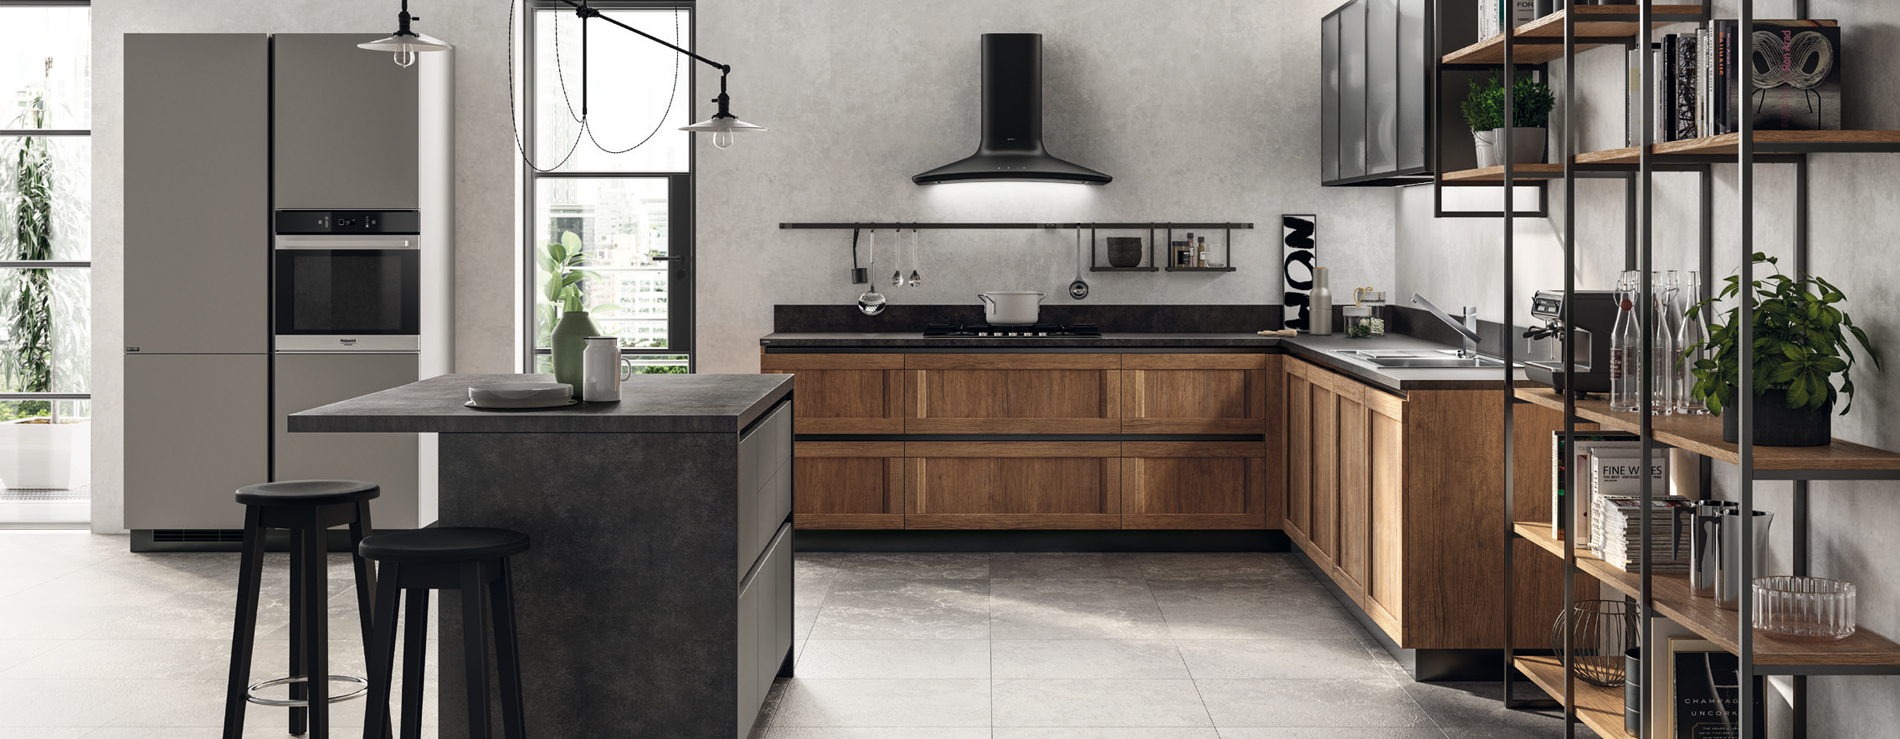 cucina scavolini evolution 218